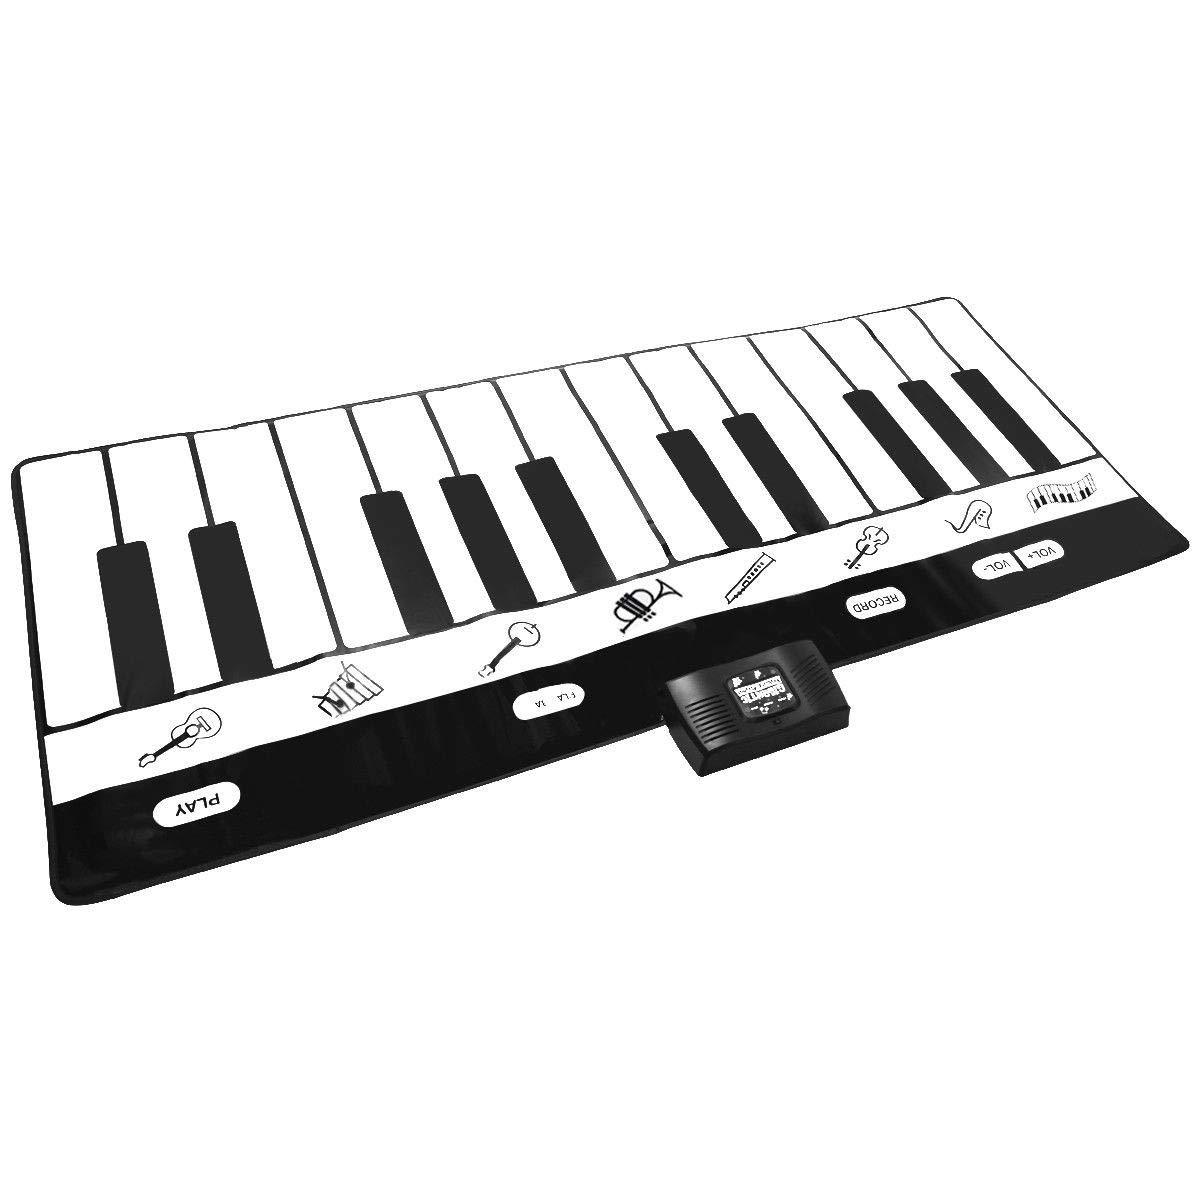 Dayanaprincess New Kids 24 Key Gigantic Piano Keyboard with 8 Instrument Settings Learning Children Play Set Fun Entertaining Book Melody by Dayanaprincess (Image #8)